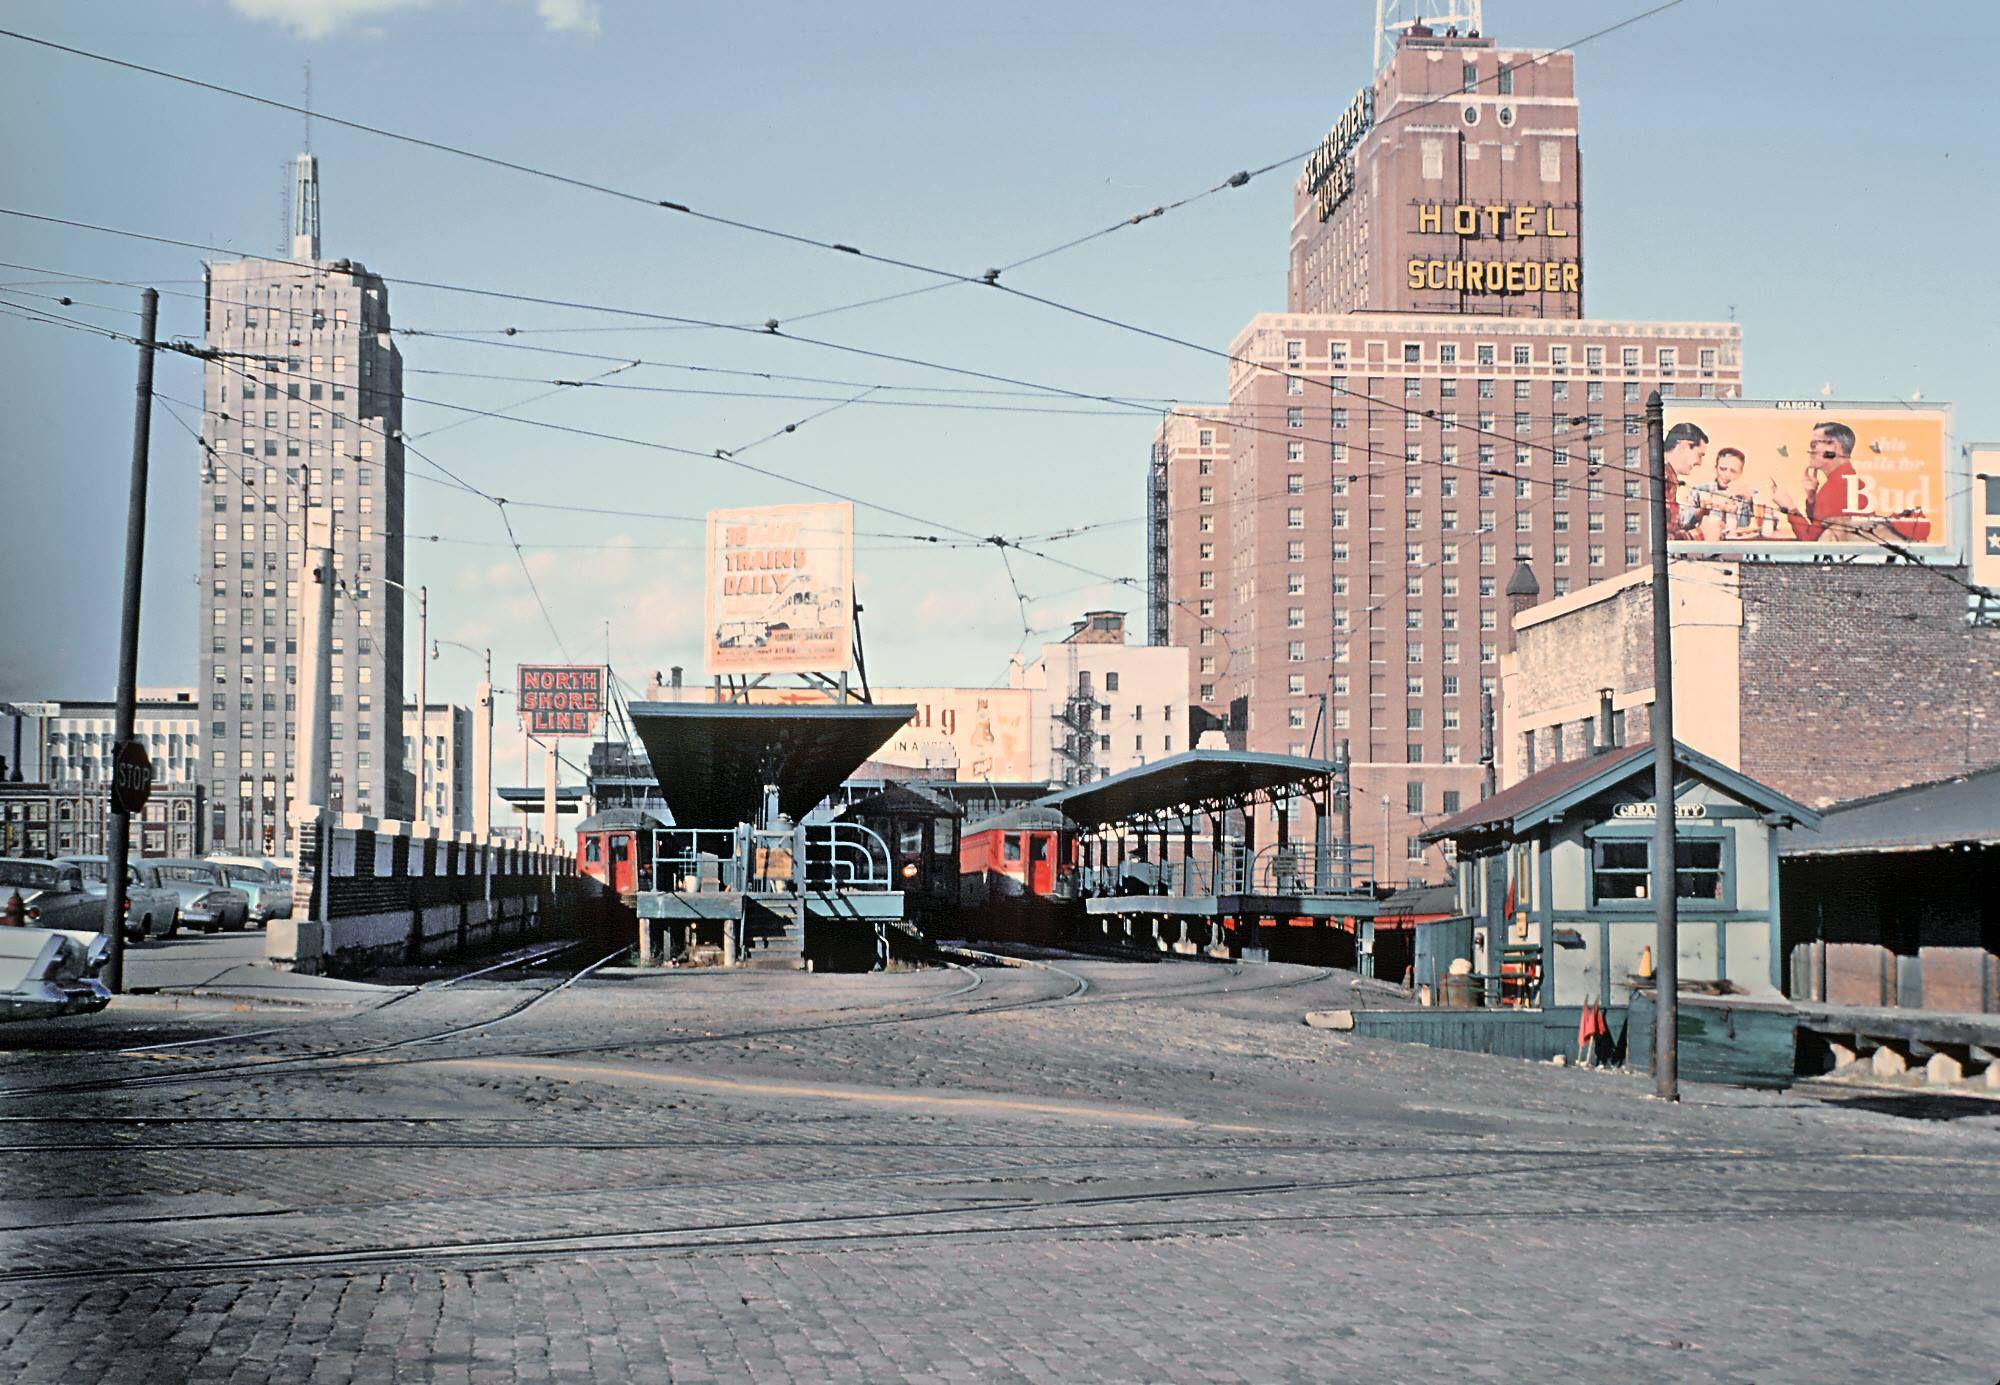 The Chicago North Shore u0026 Milwaukee Railroad